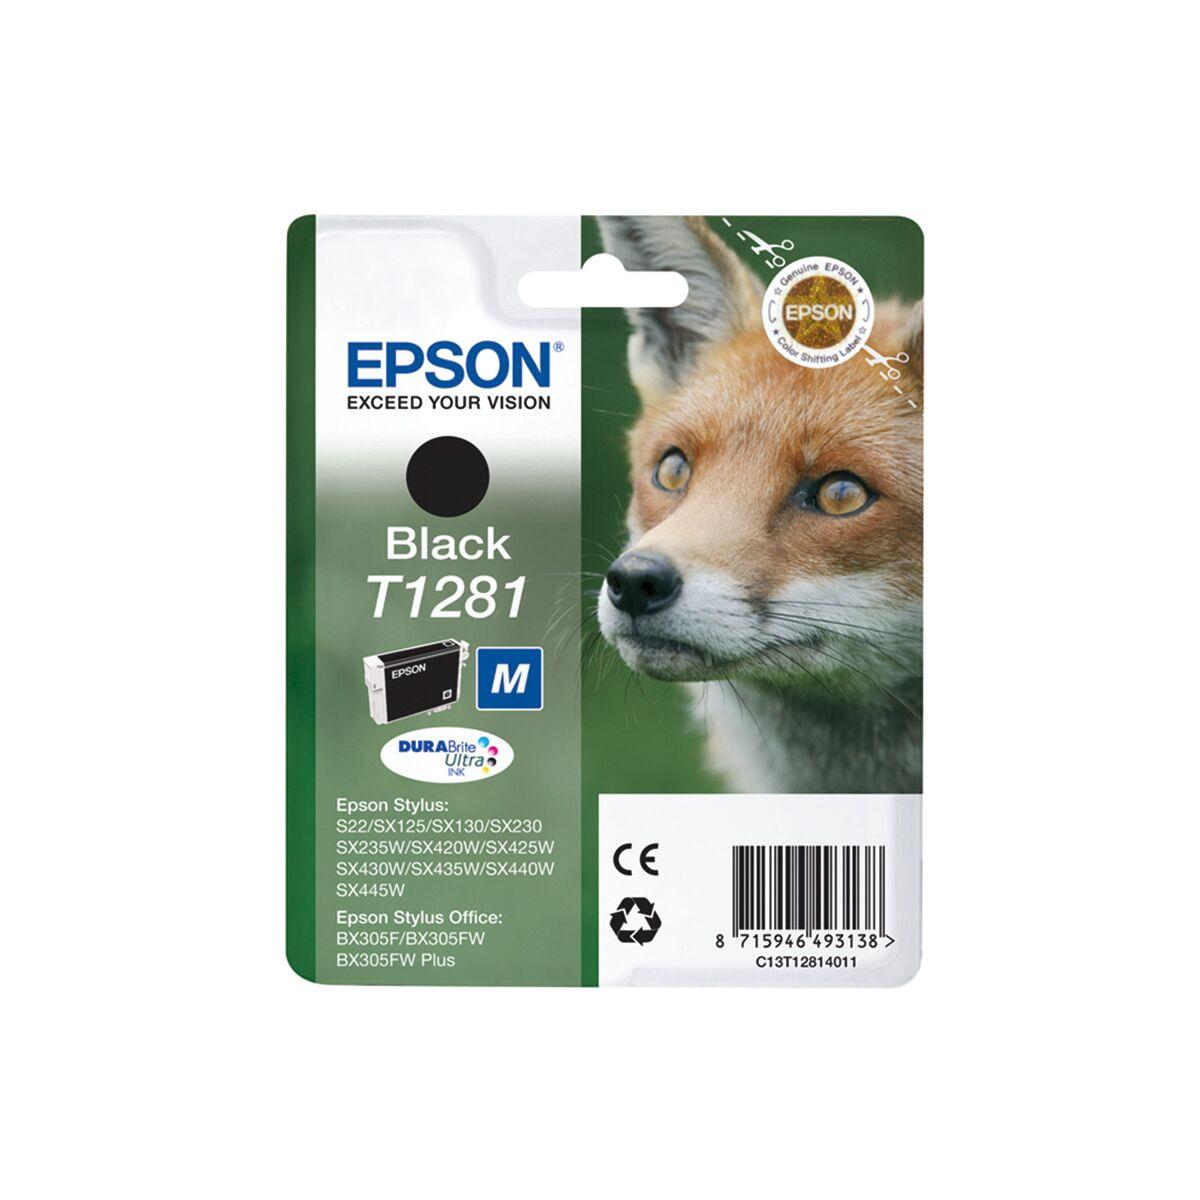 Cartouche Imprimante Epson «renard» - T1281 Noir